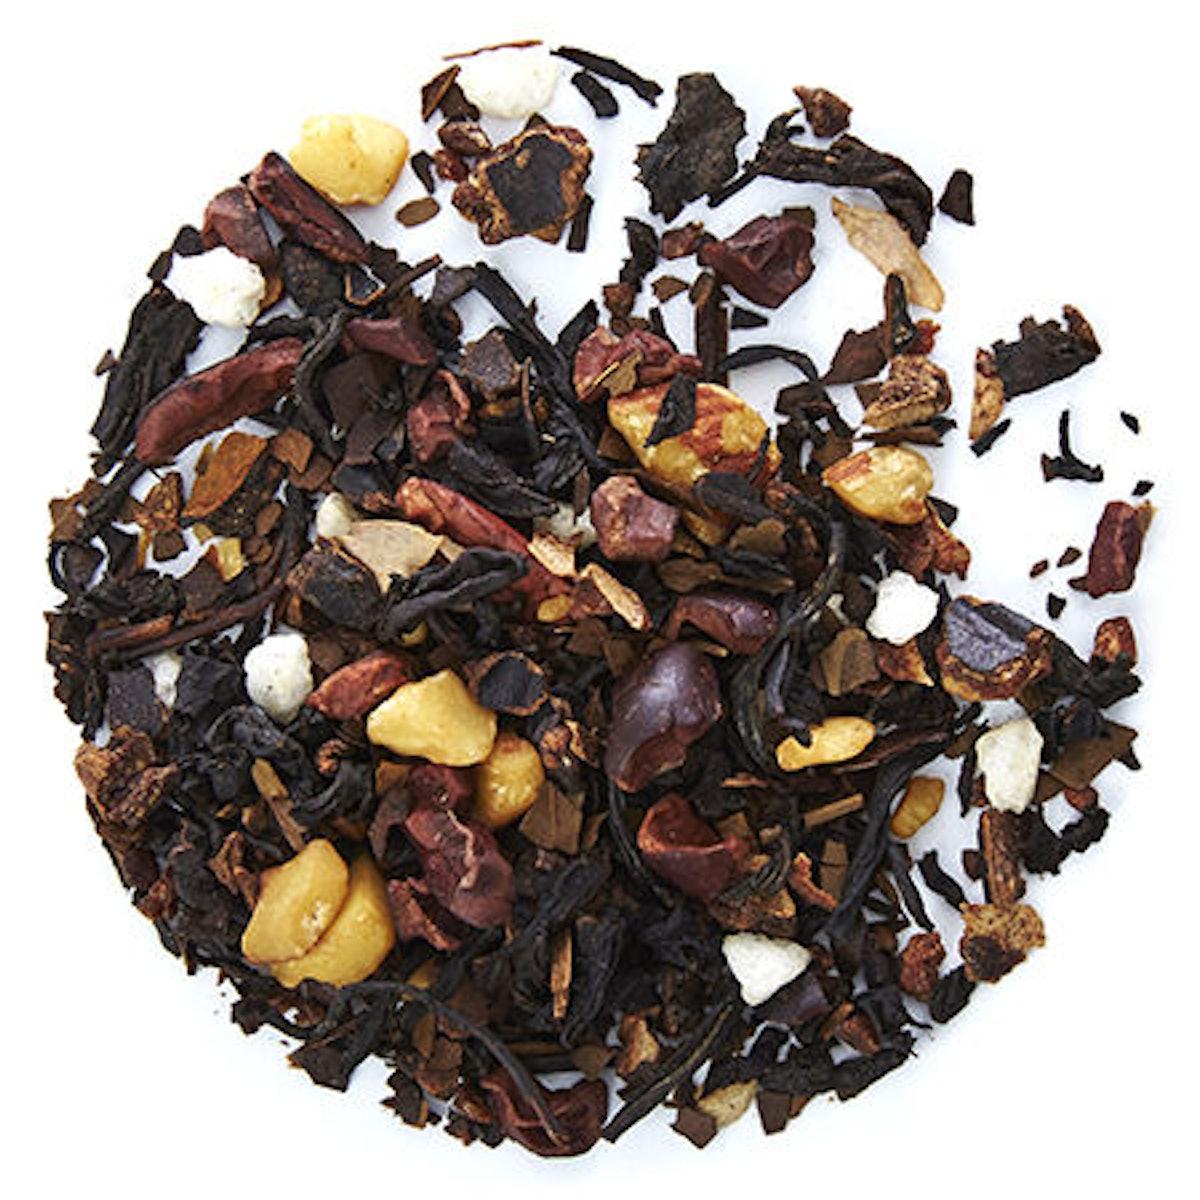 DAVIDsTEA Chocolate Covered Almond Black Tea